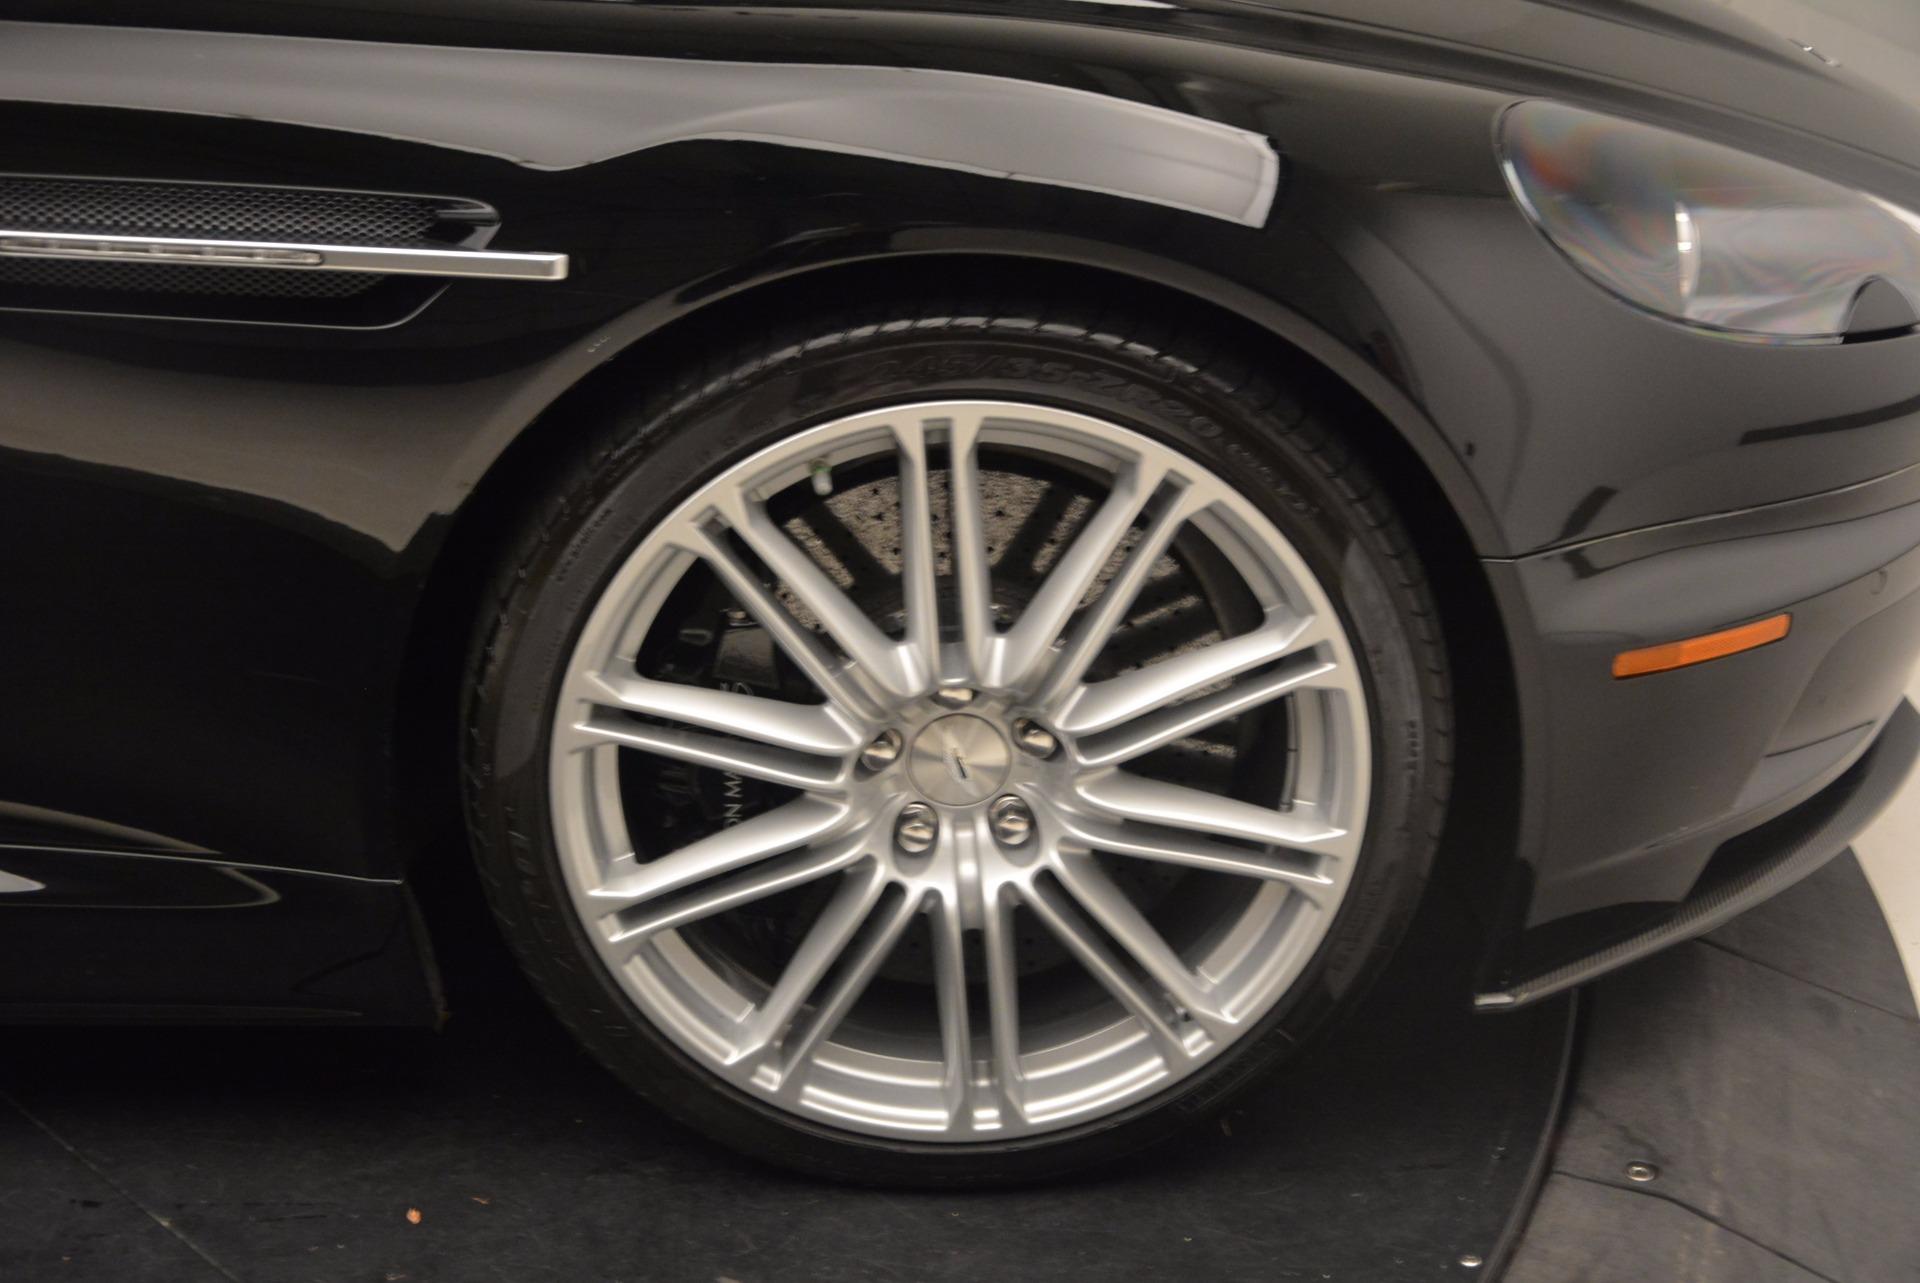 Used 2009 Aston Martin DBS